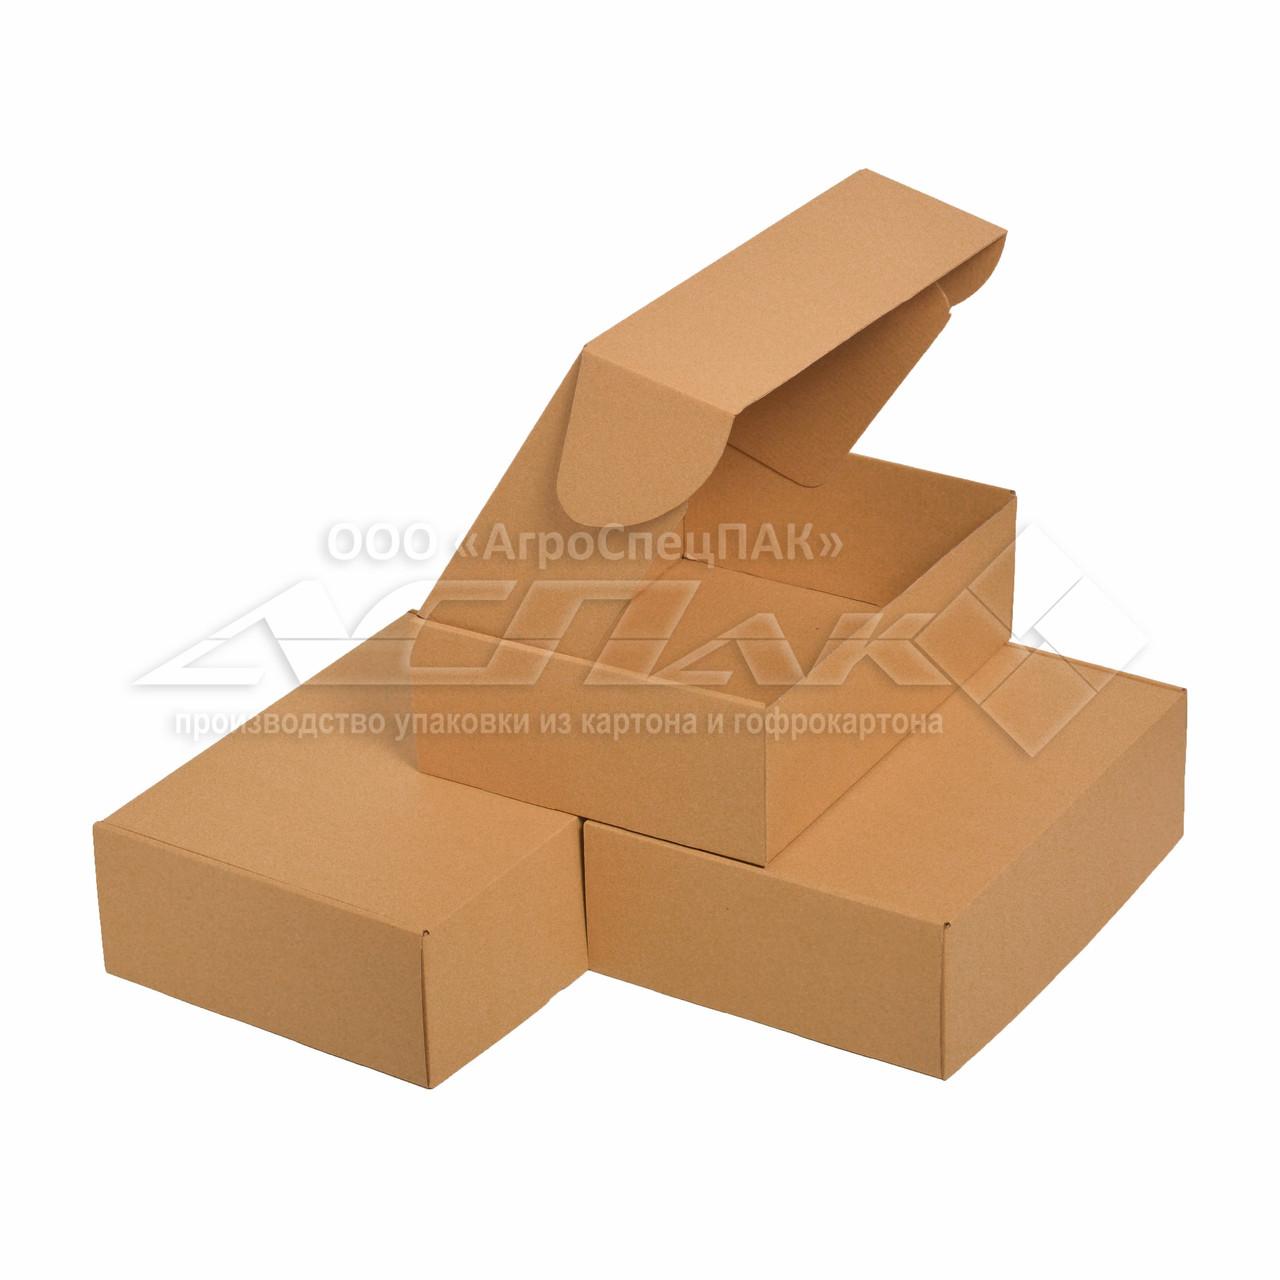 Упаковочные коробки 320x240x105 бурые. Крафтовые коробки.